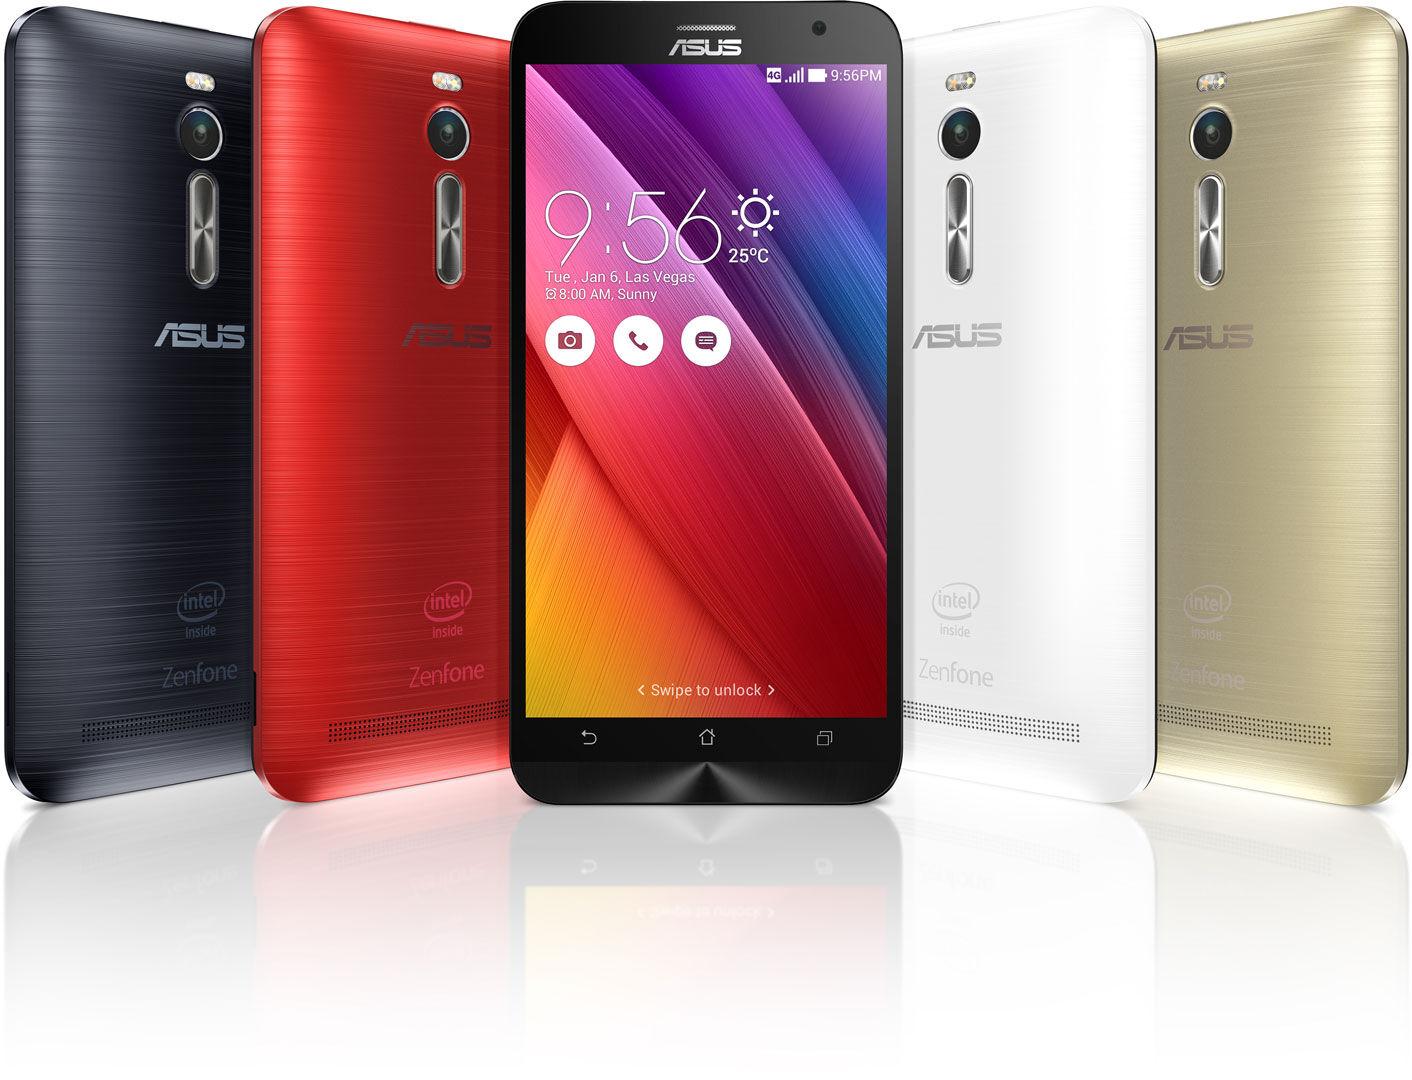 ASUS Zenfone 2 Launched in Jakarta 27